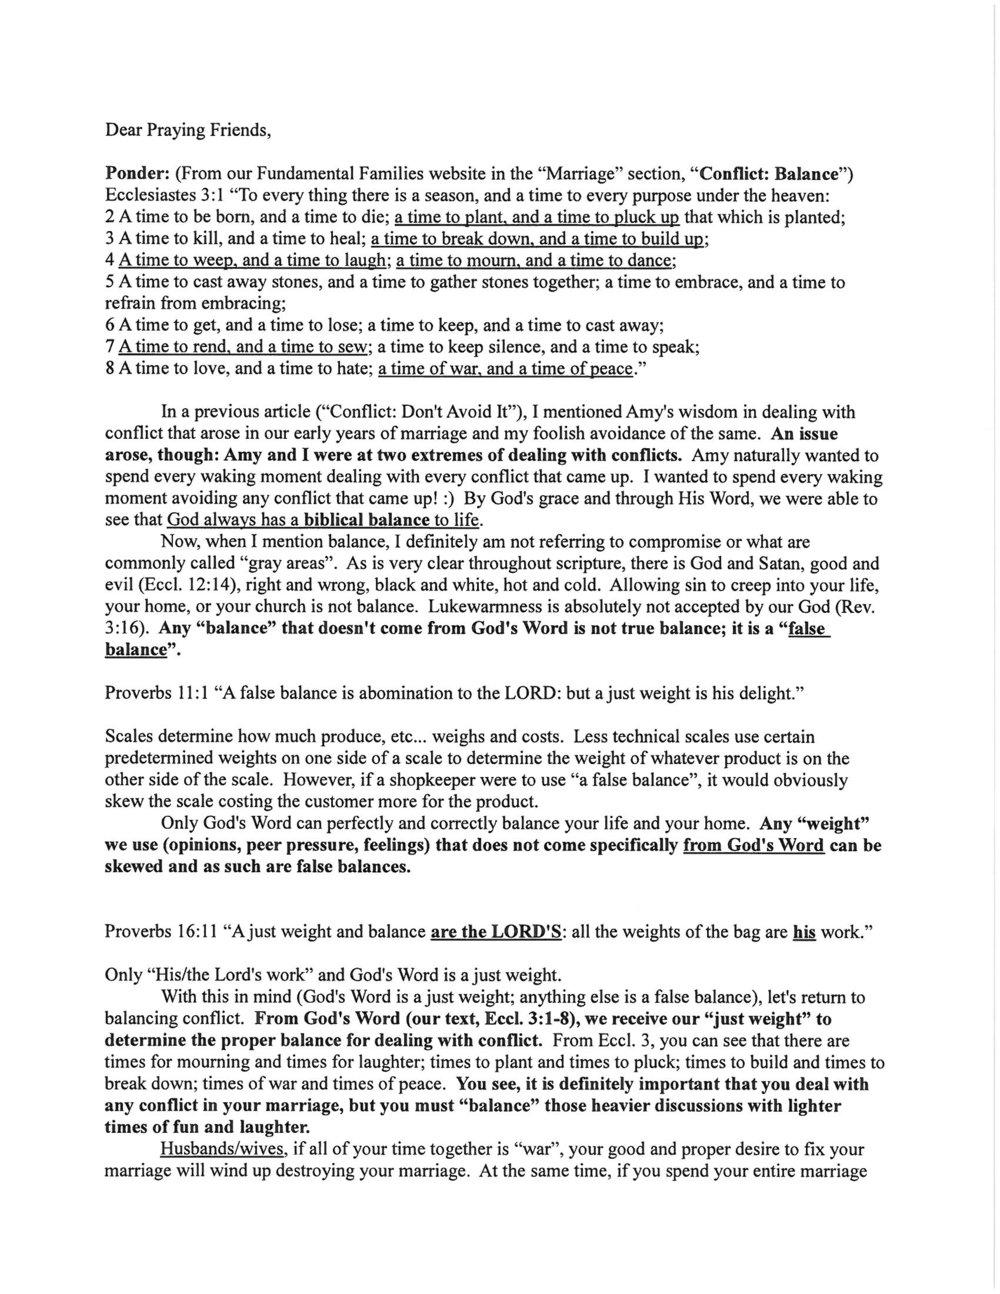 alberico 4-17 part 1.jpg